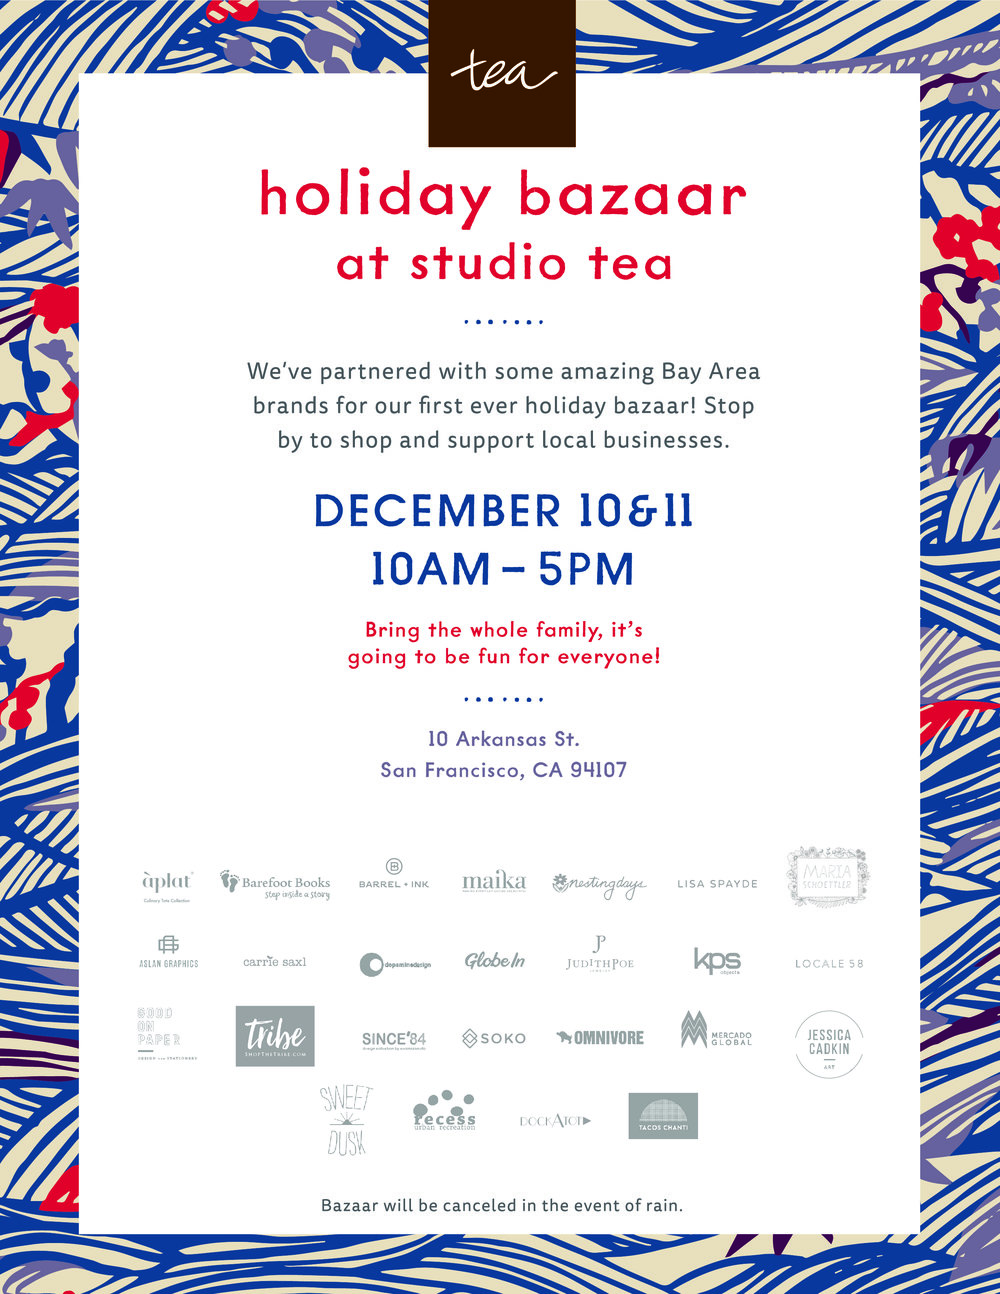 Studio Tea Holiday Bazaar: December 11th  /  www.goodonpaperdesign.com/blog/2016/12/5/studio-tea-holiday-bazaar-december-11th  /  @good_on_paper